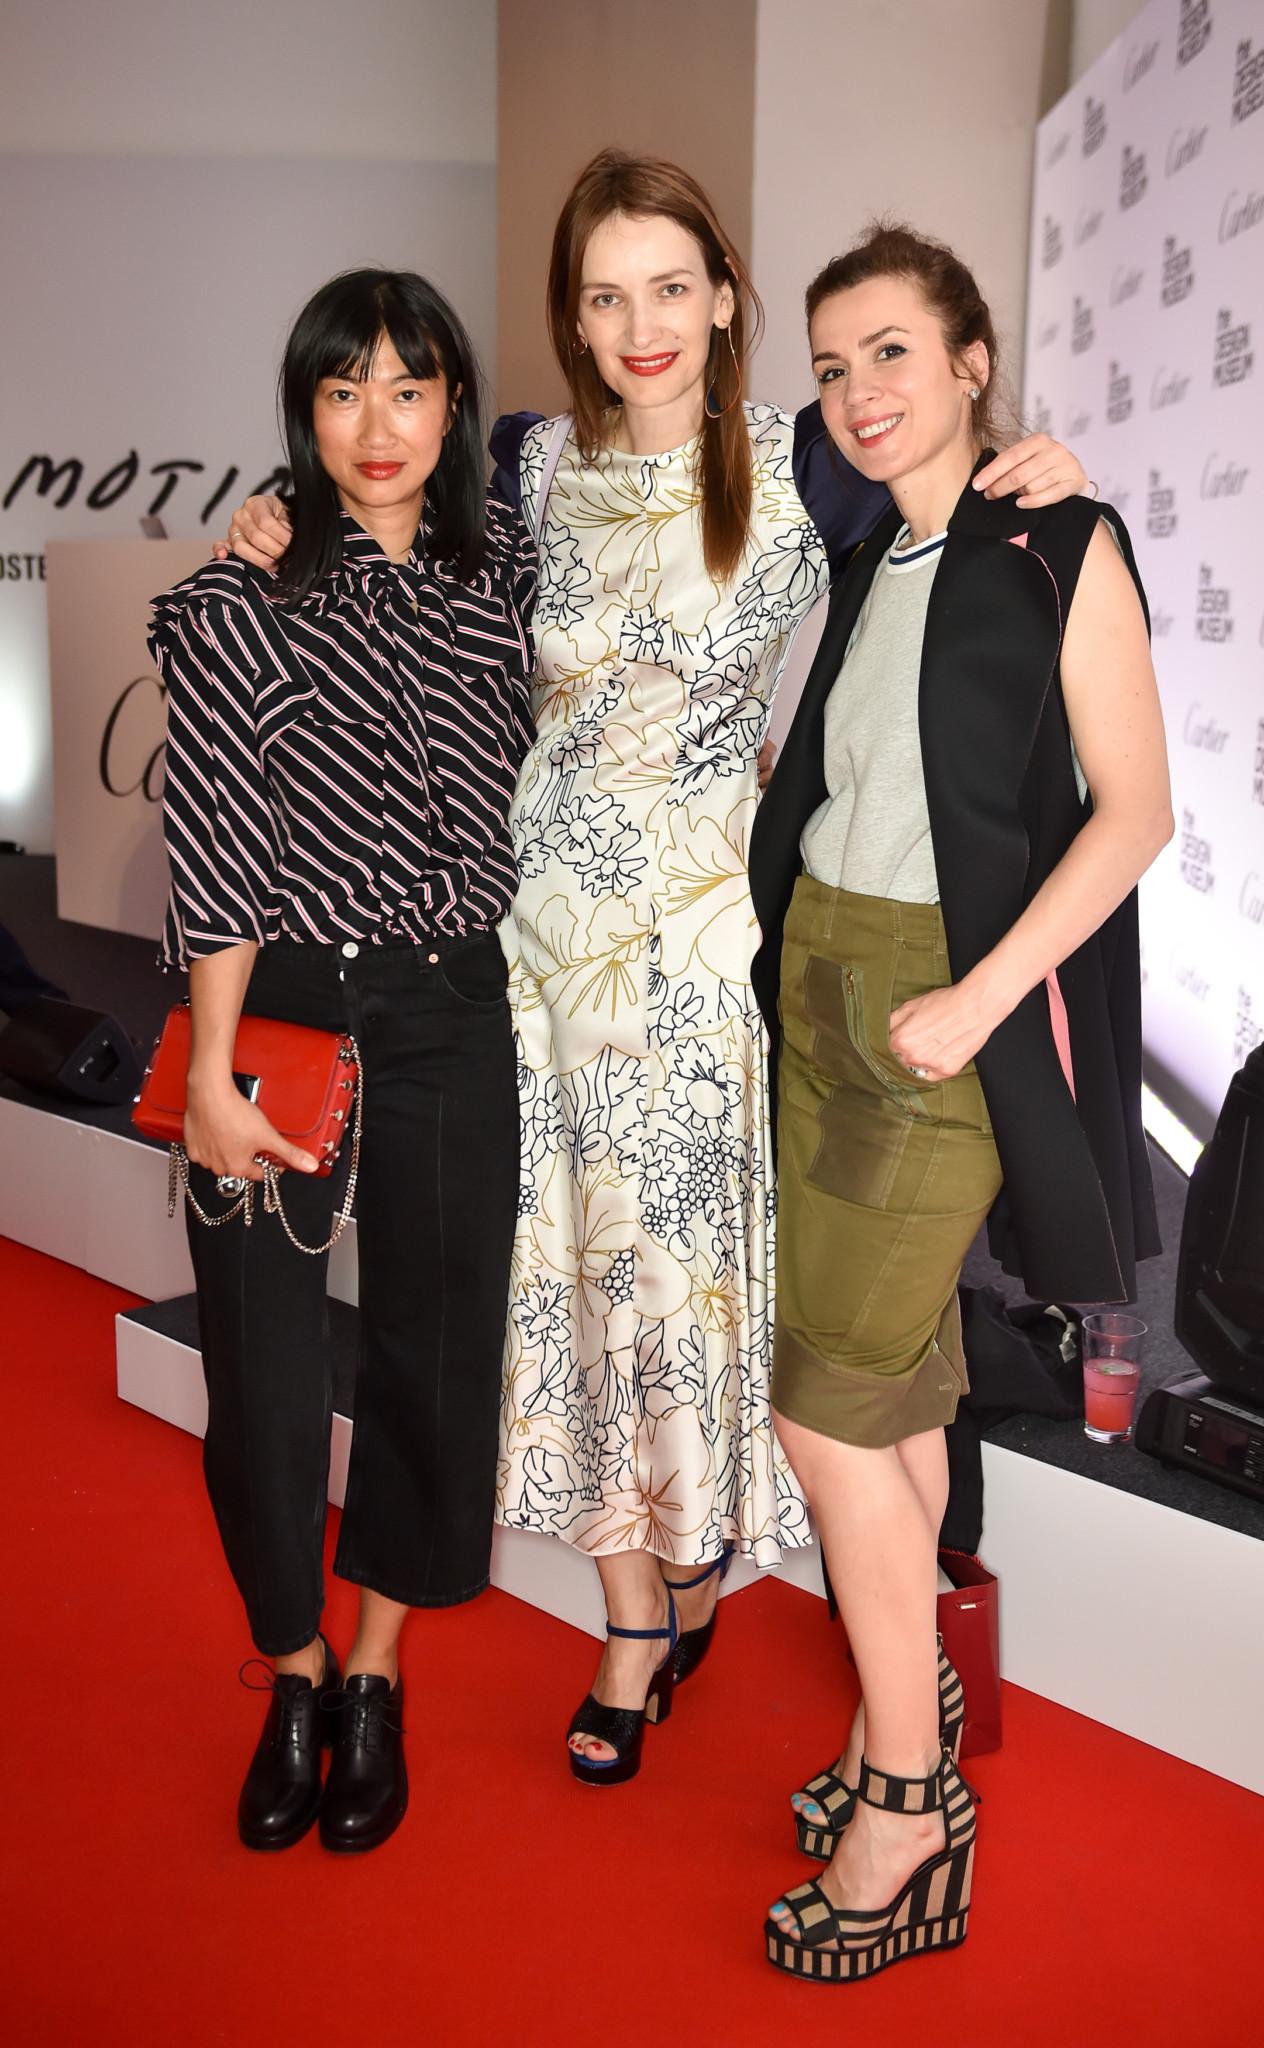 Mimi Xu, Roksanda Illincic and Lara Bohinc